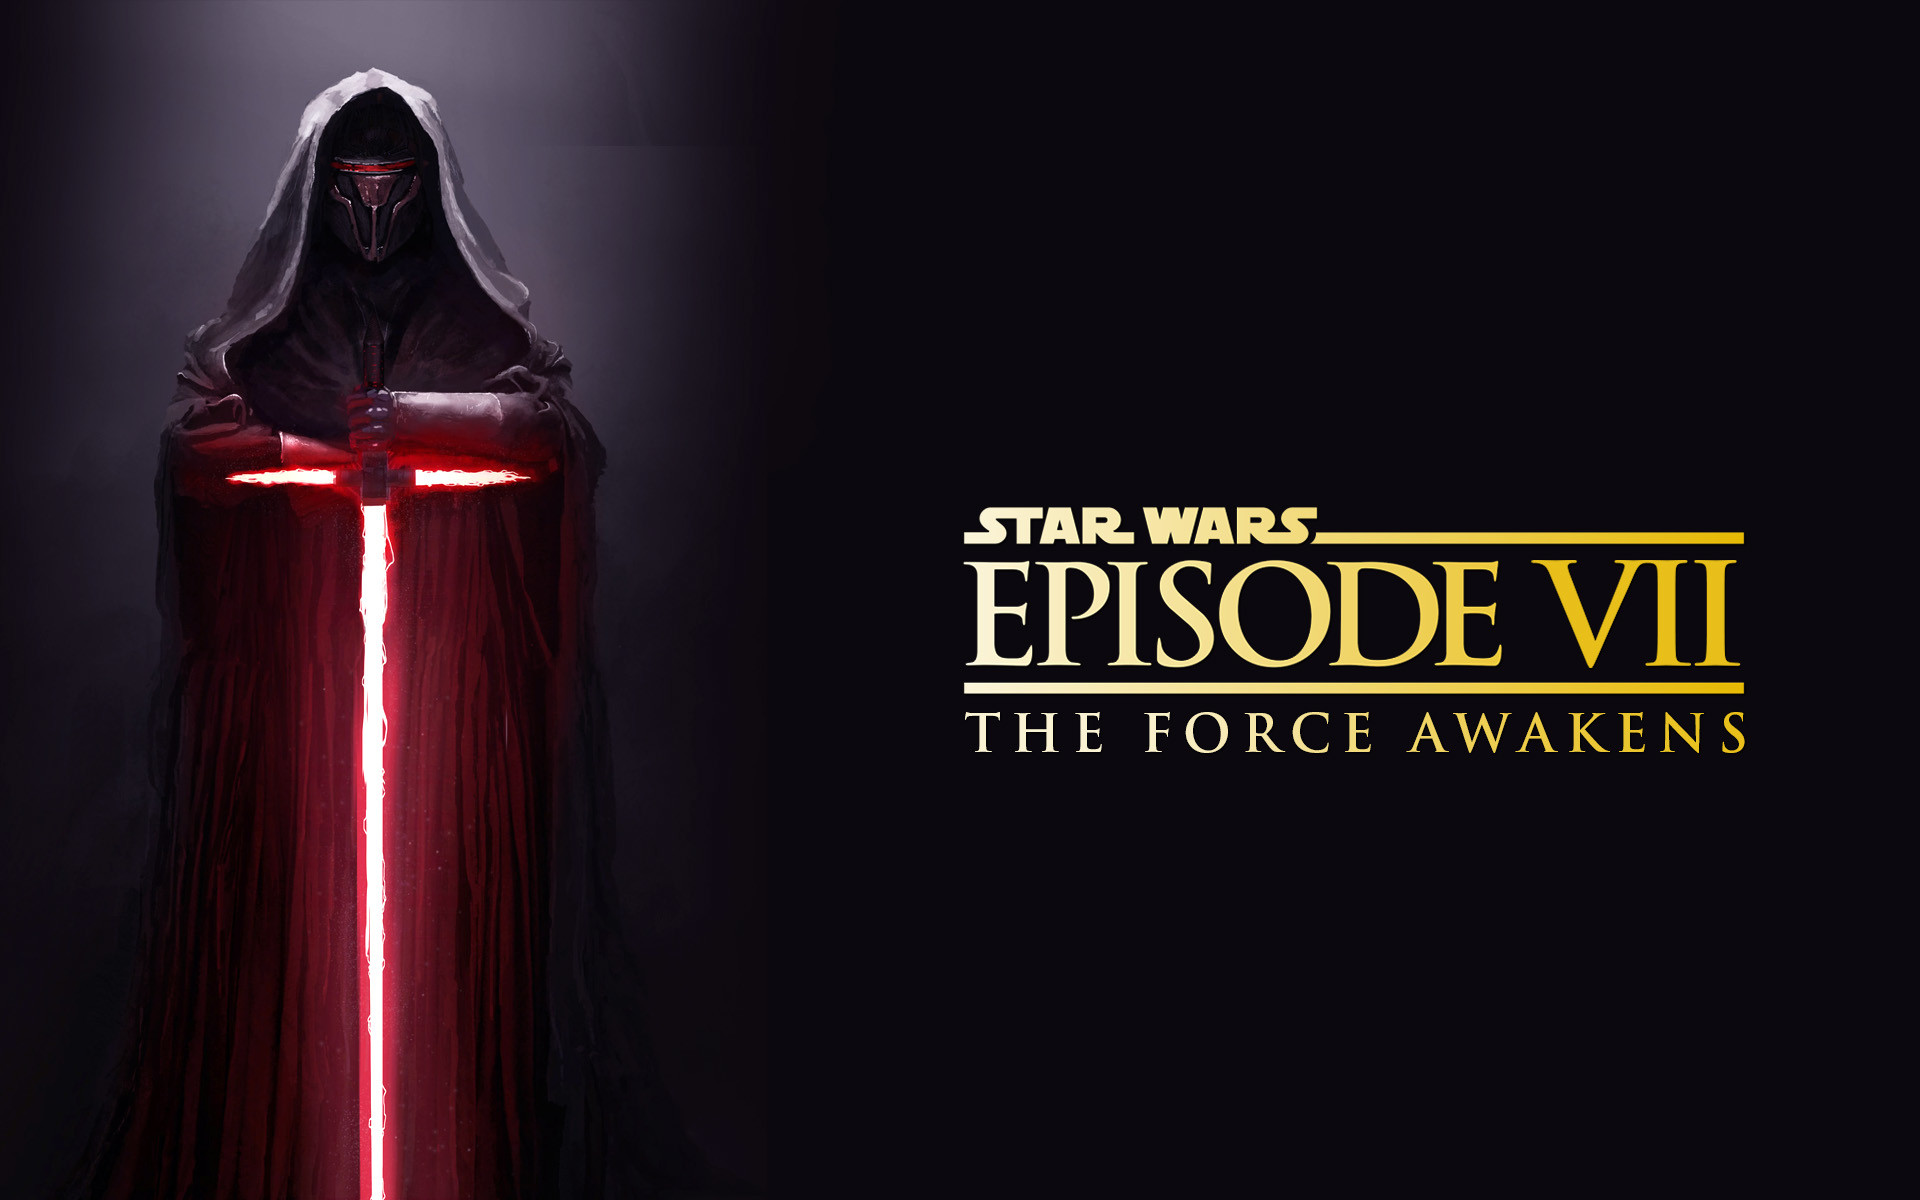 Star Wars Episode 4 wallpapers